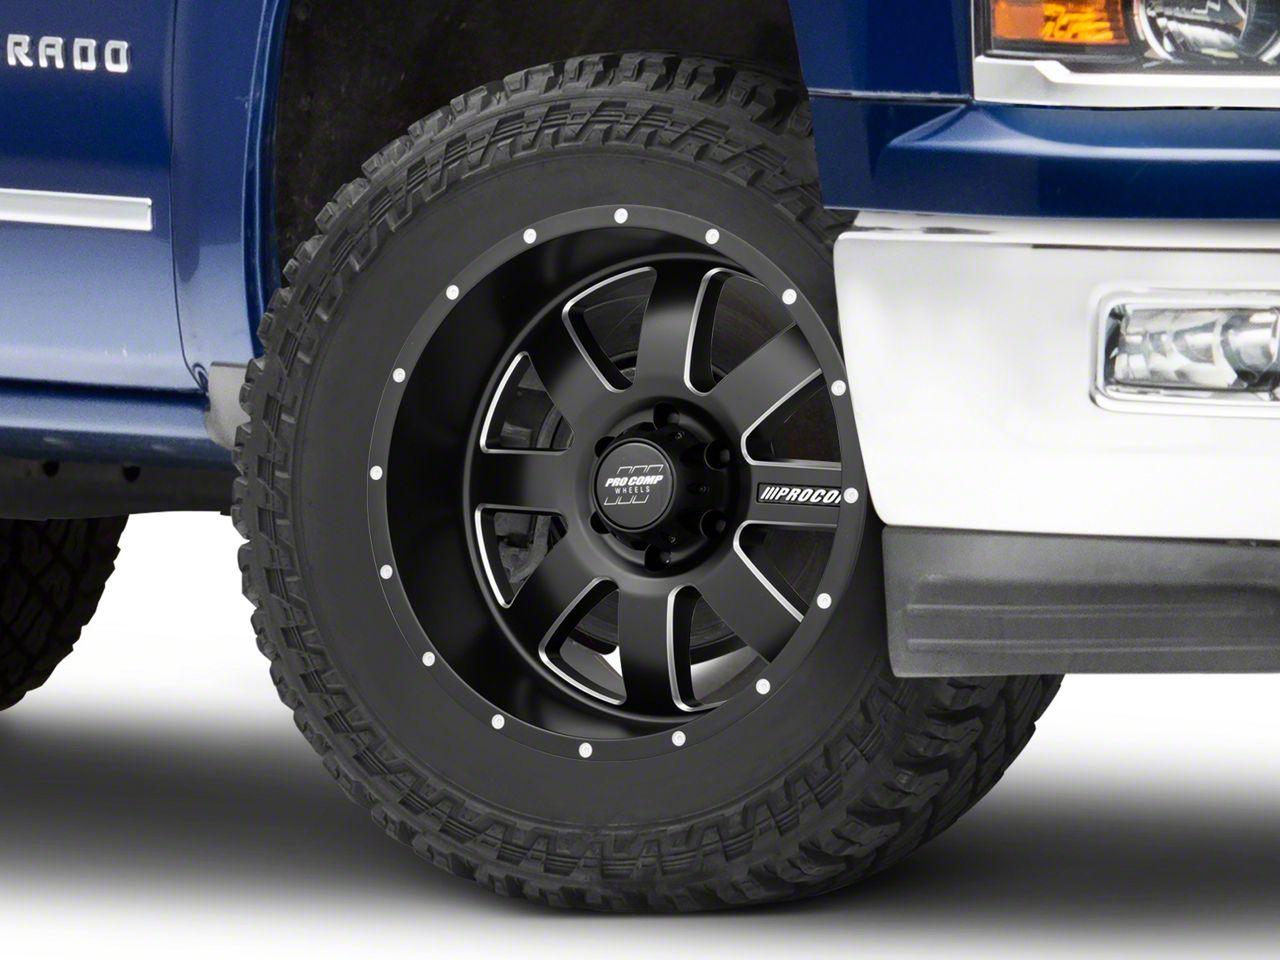 Pro Comp Trilogy Satin Black 6-Lug Wheel - 20x10 (99-18 Silverado 1500)